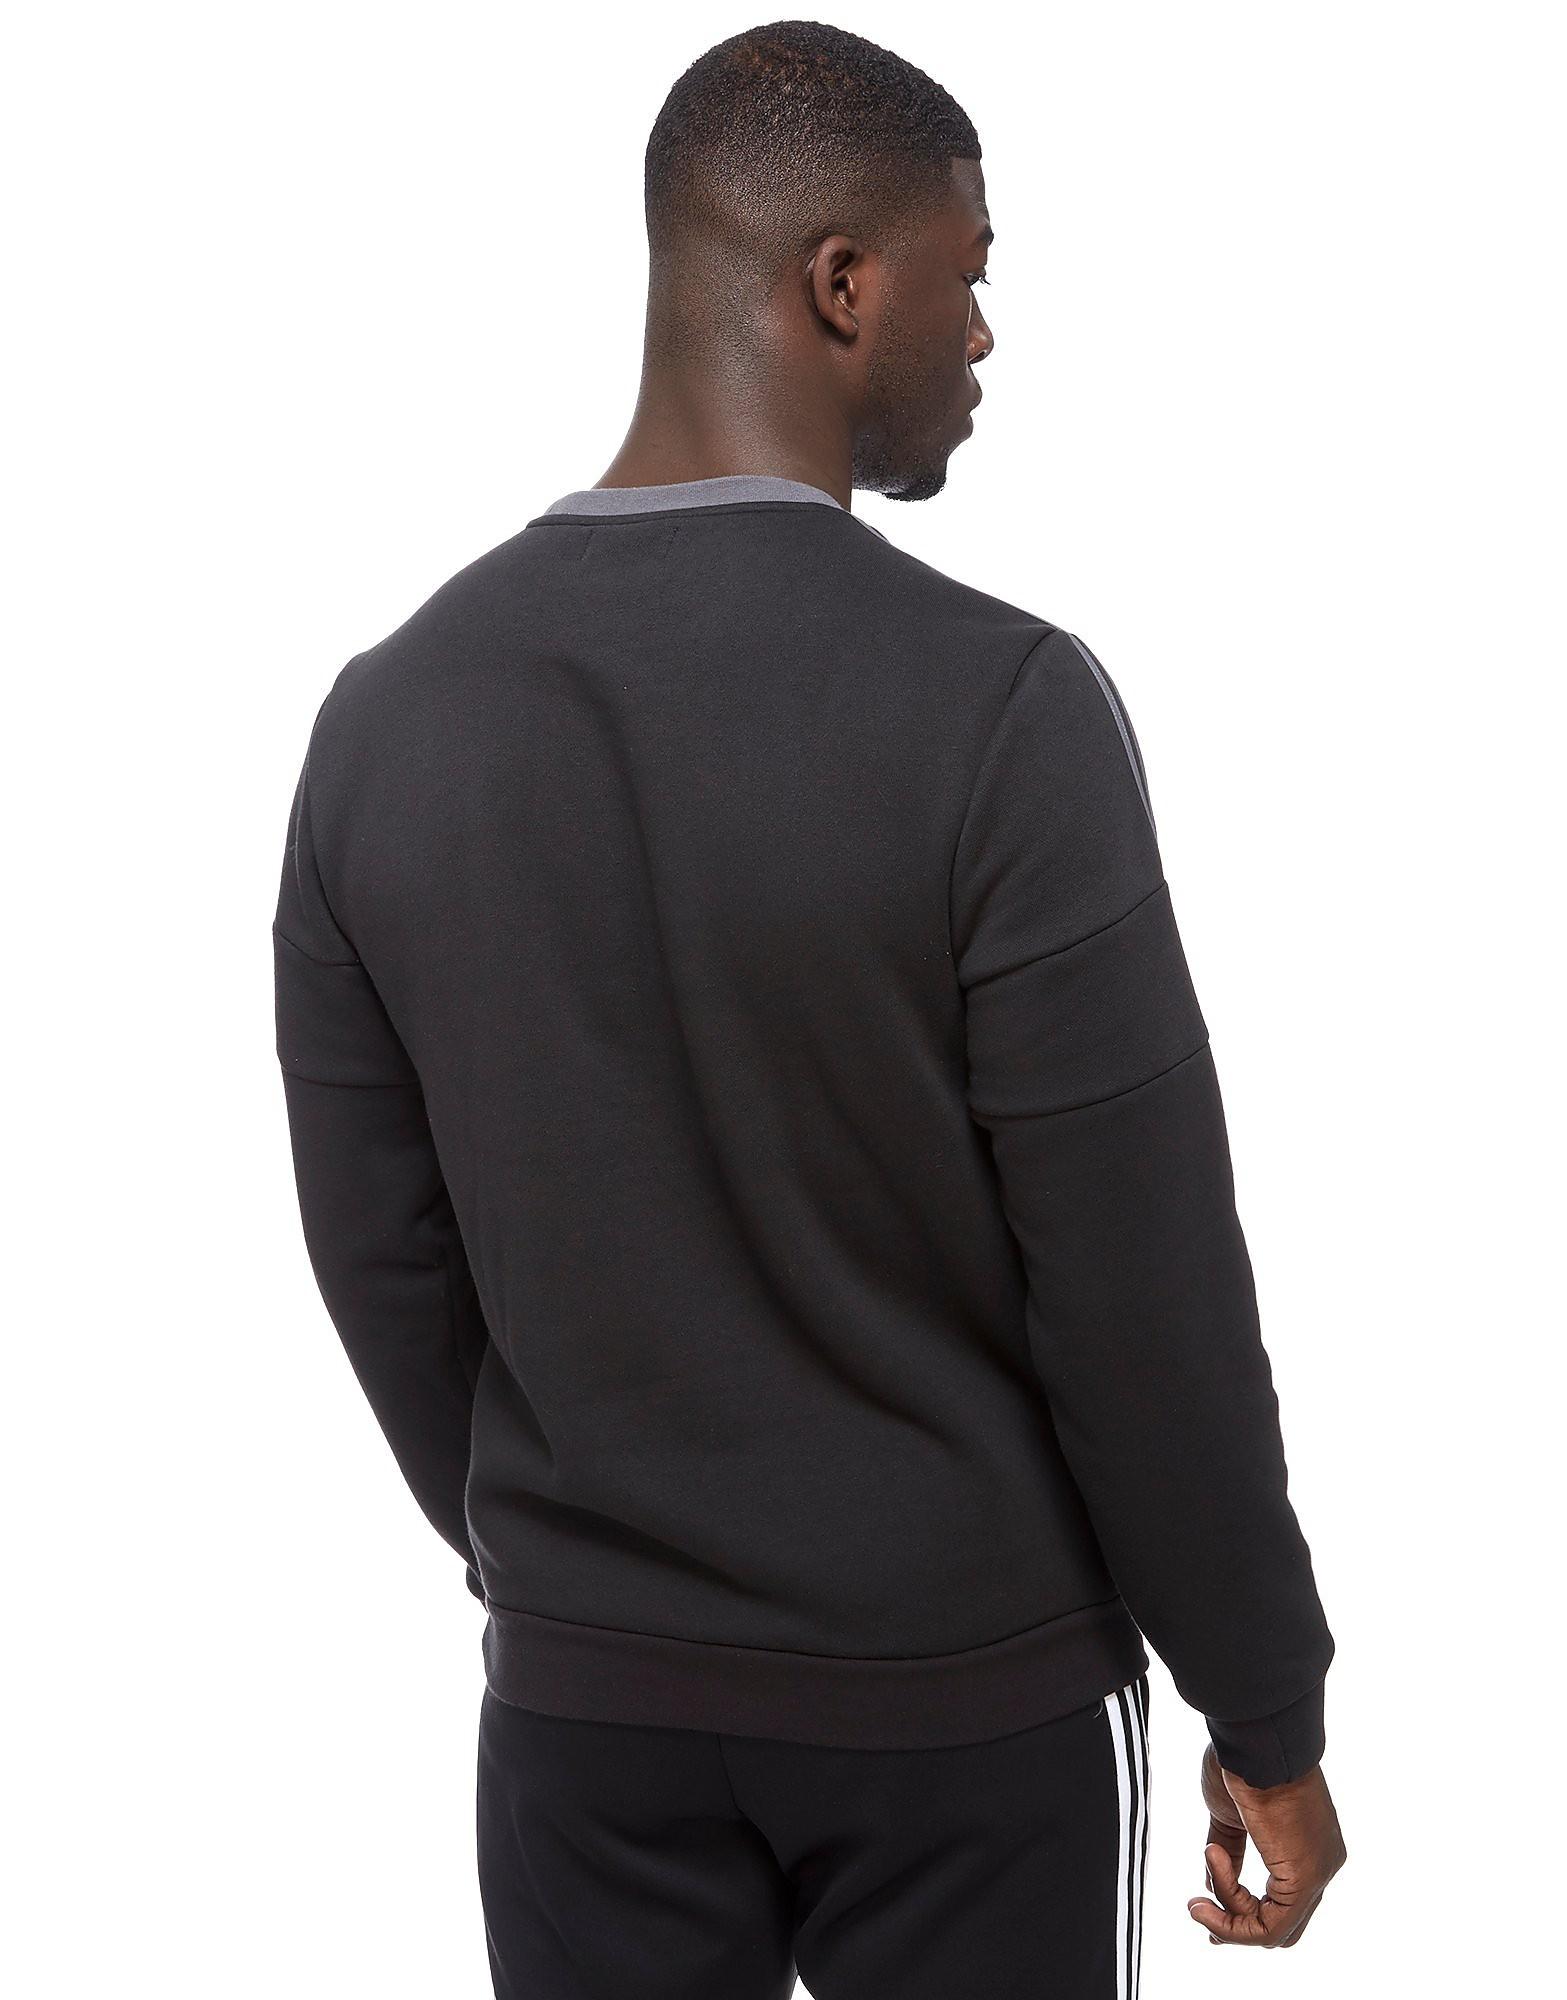 adidas Originals Nomad Sweatshirt